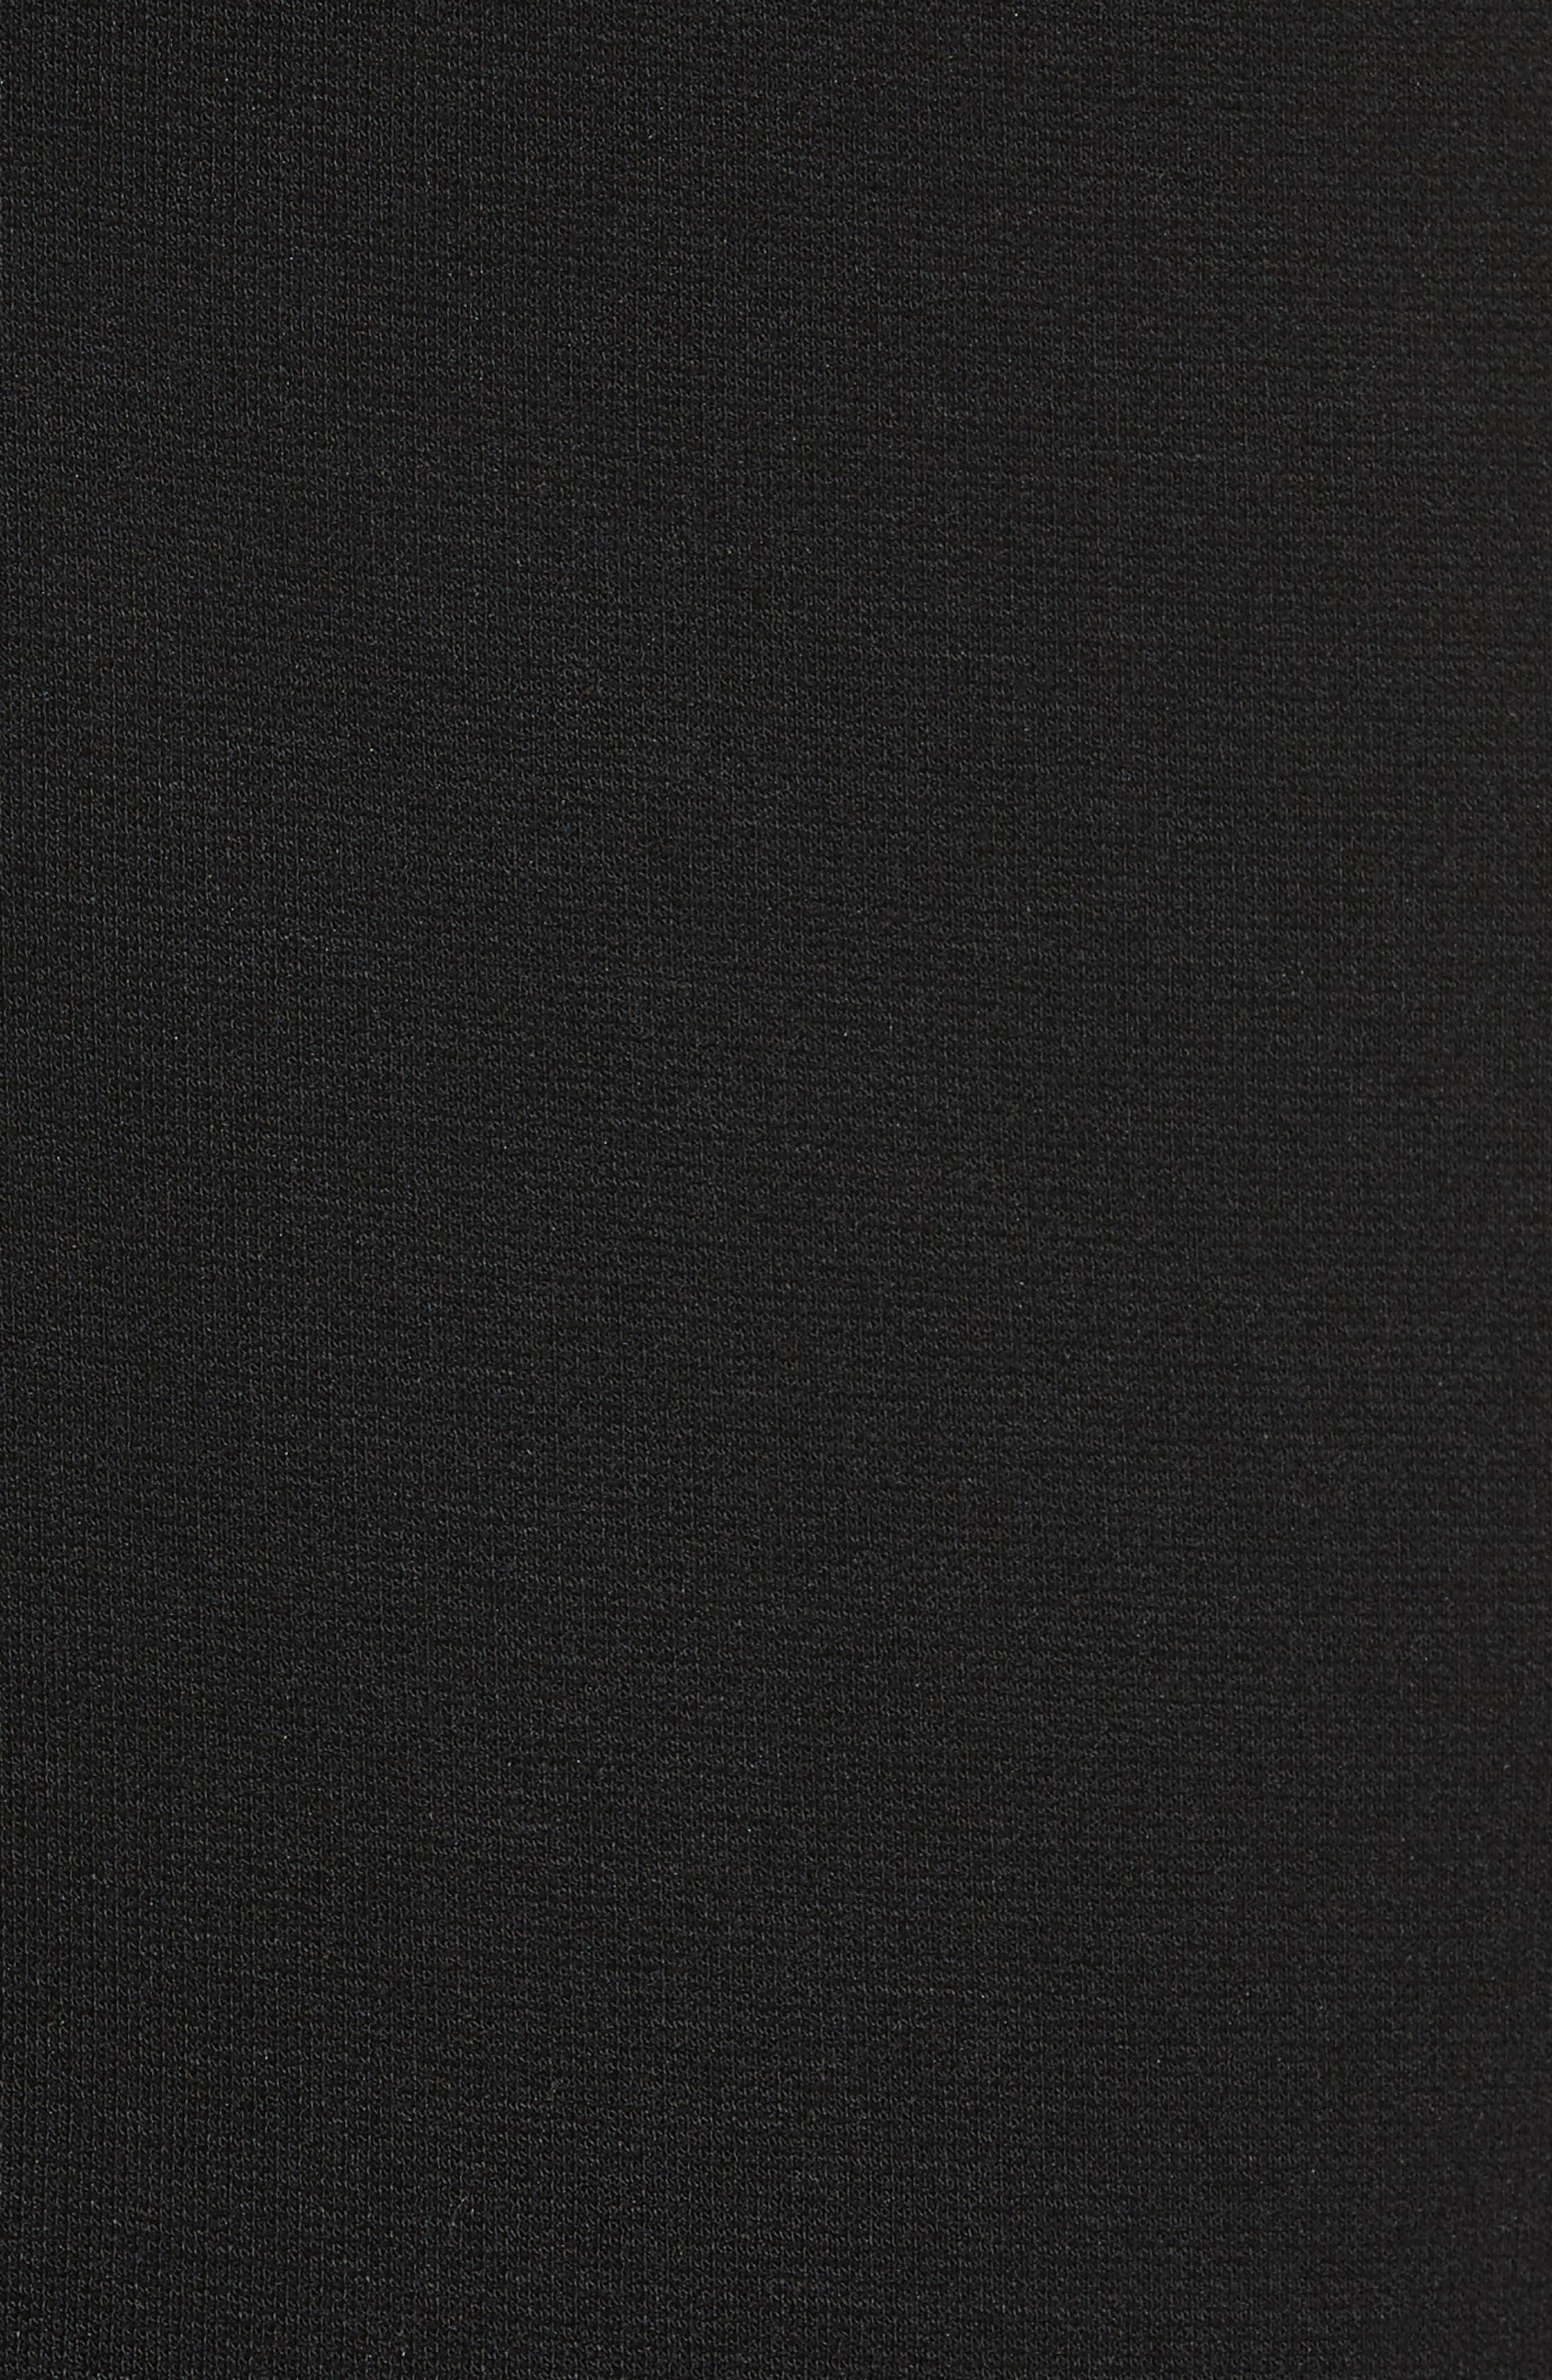 Rhinestone Halter Dress,                             Alternate thumbnail 6, color,                             001